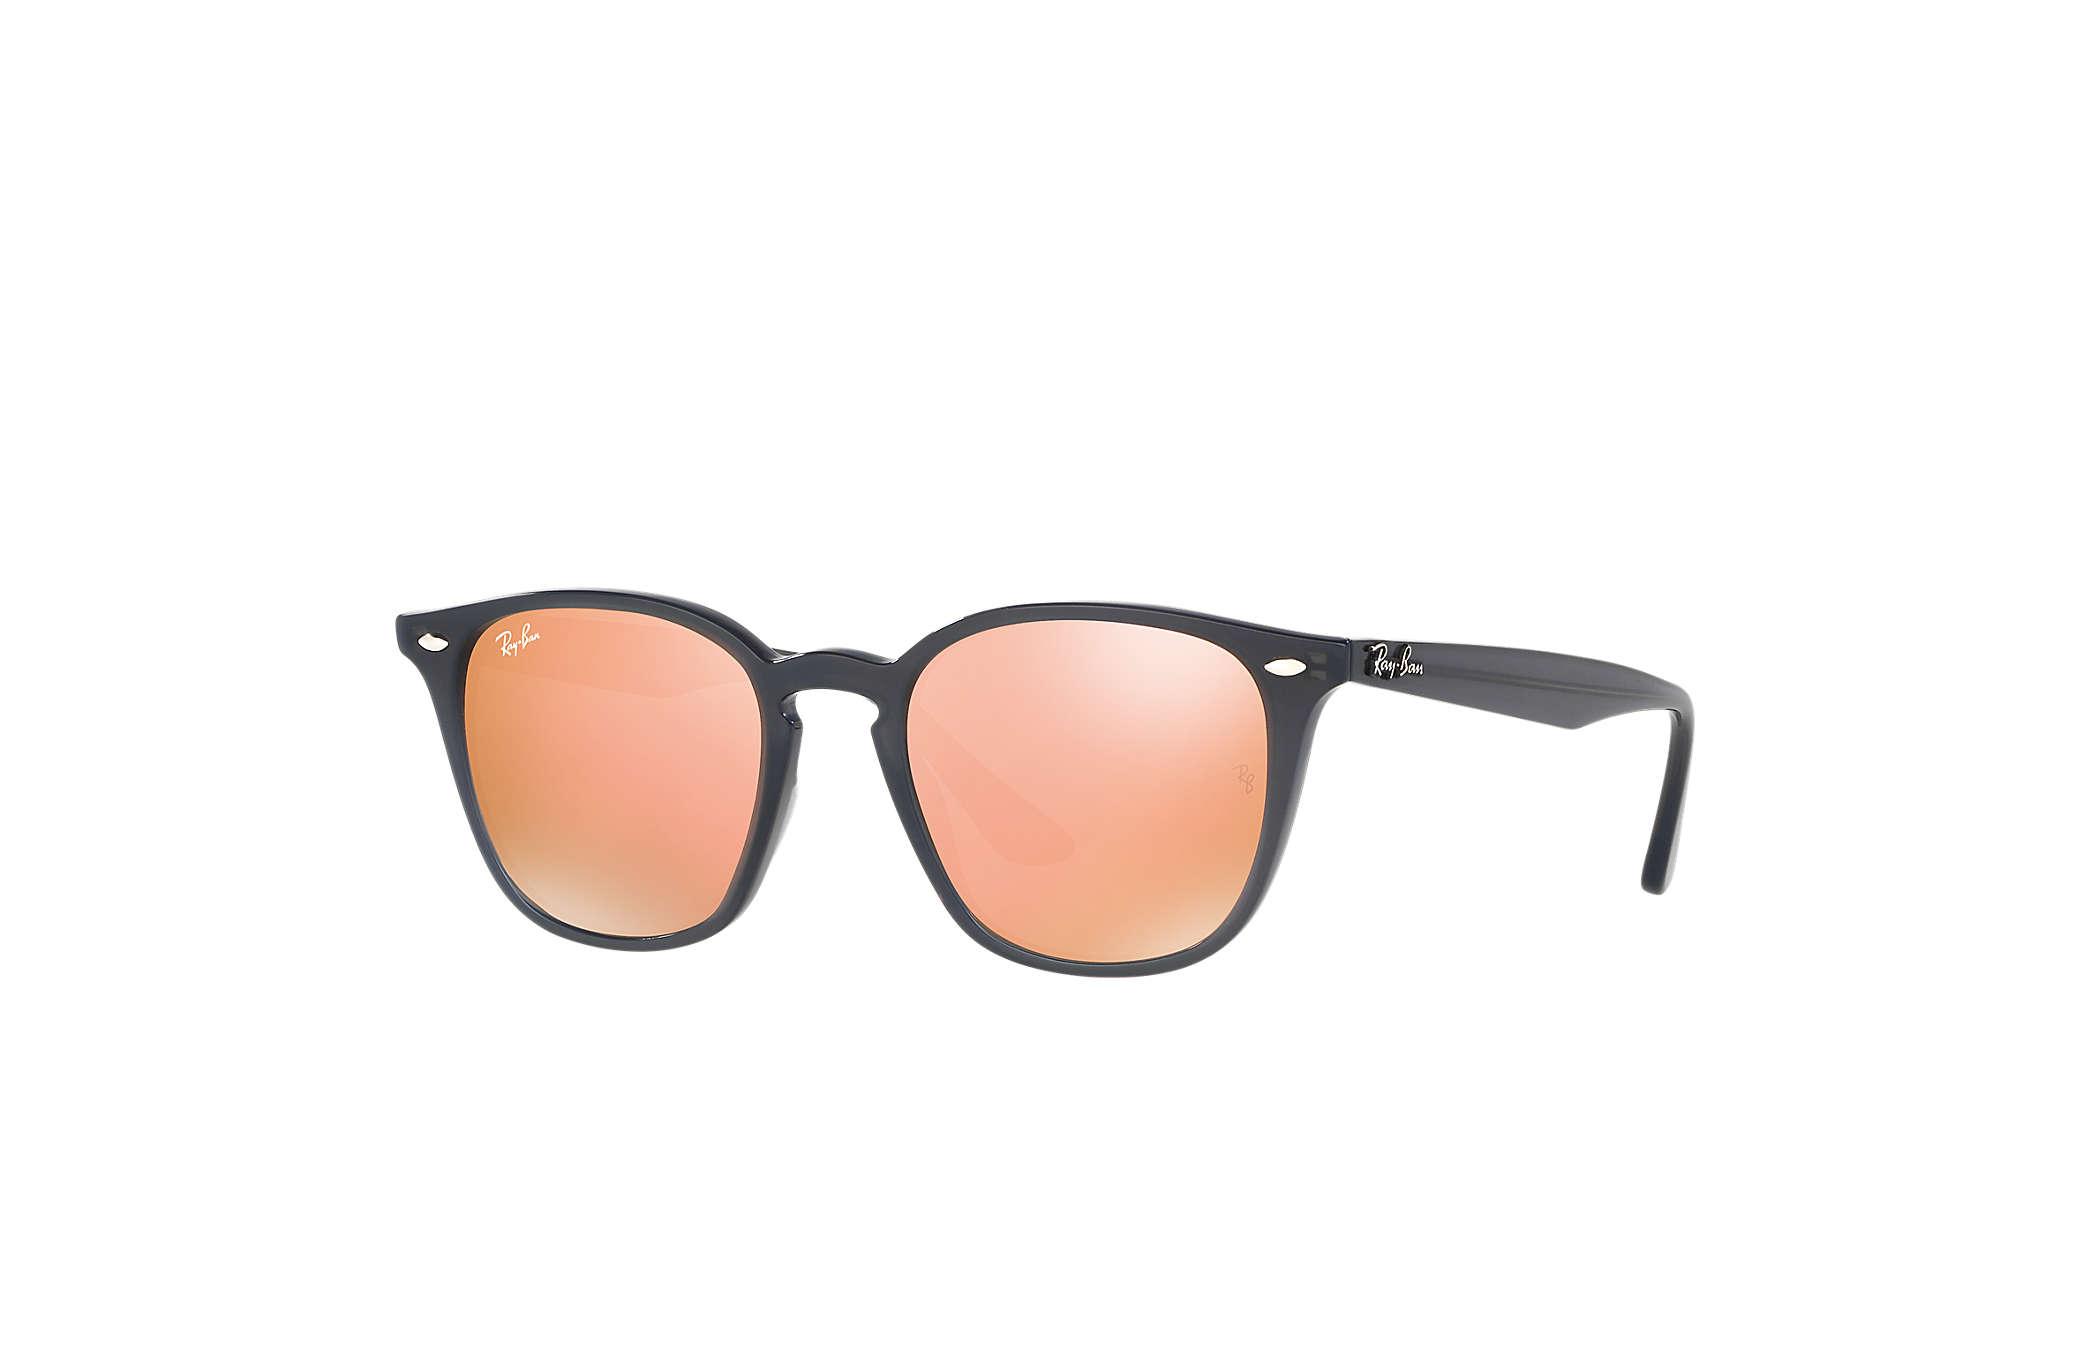 788399cc8b9 Ray-Ban RB4258 Grey - Propionate - Orange Lenses - 0RB425862307J50 ...